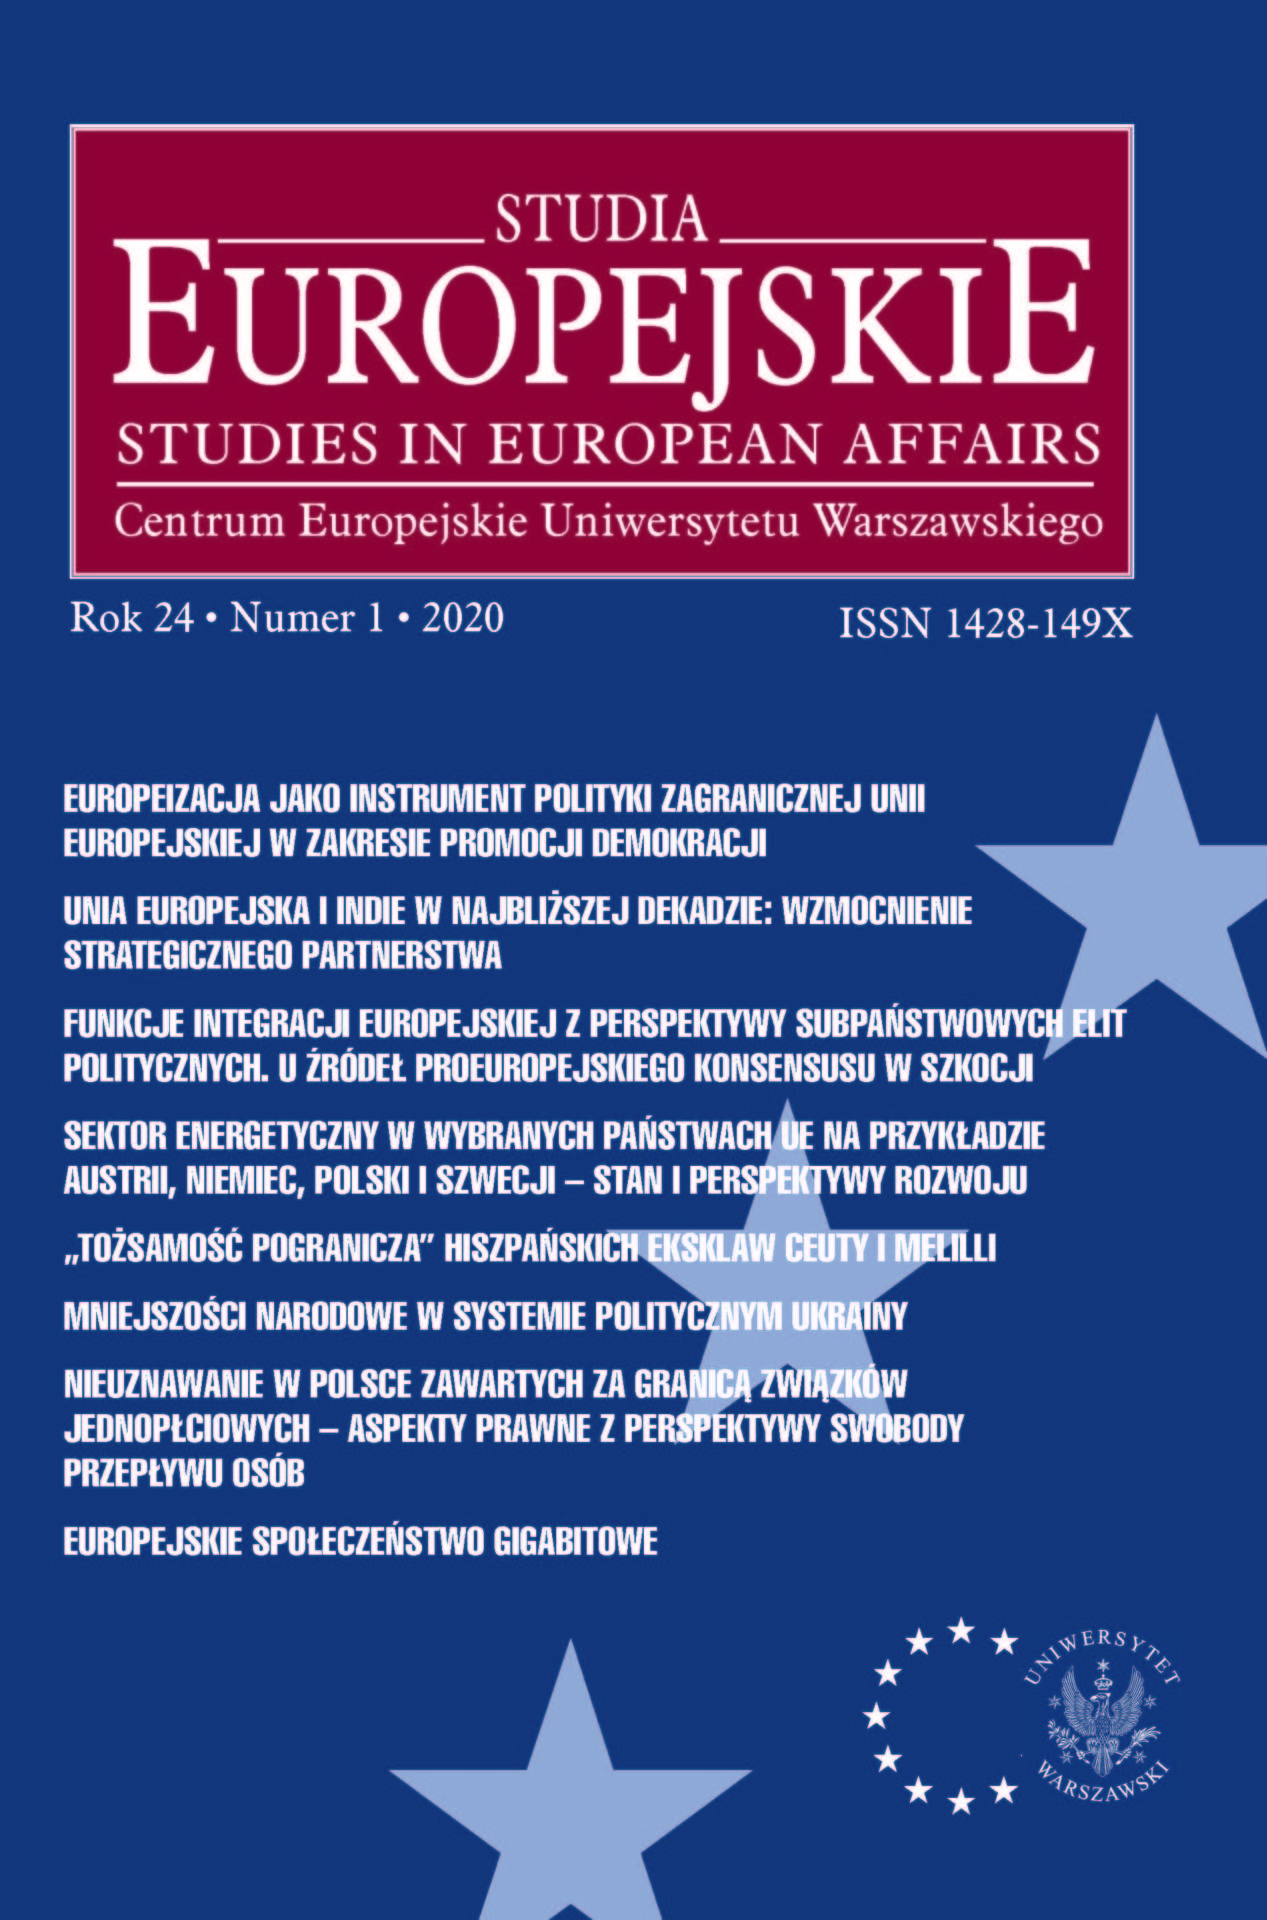 Kwartalnik Studia Europejskie 3-2016